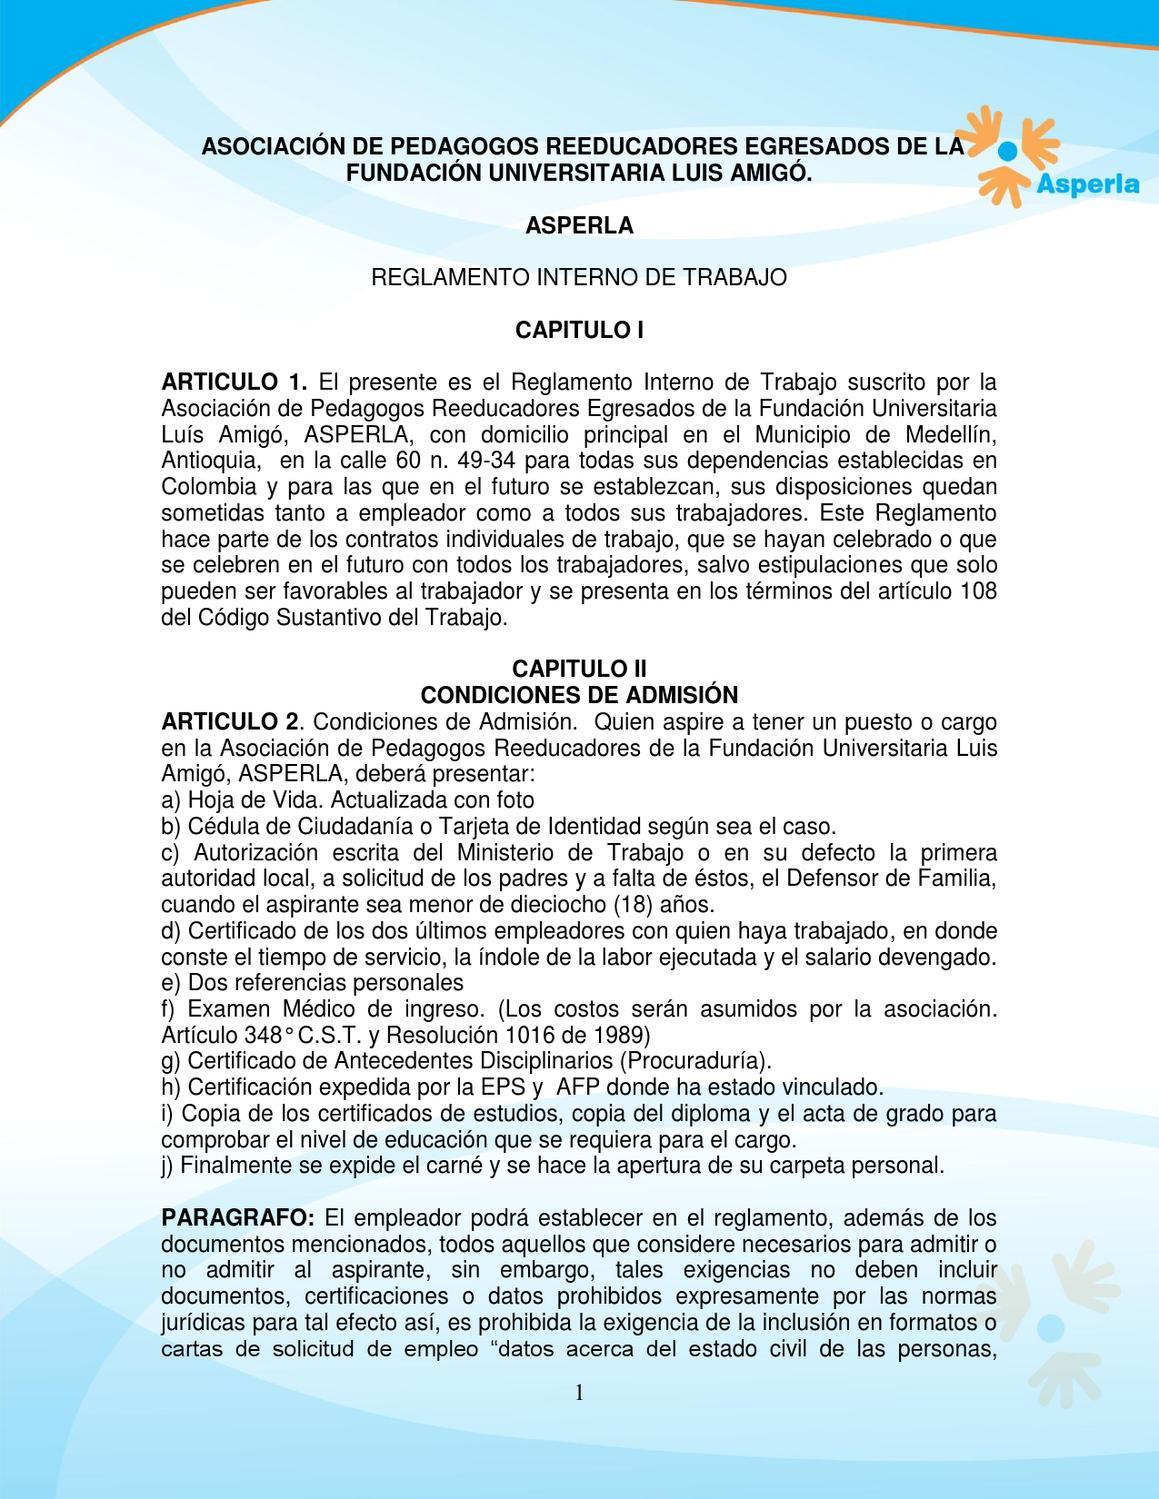 Reglamento interno de trabajo - Asperla by Asperla Ong - issuu